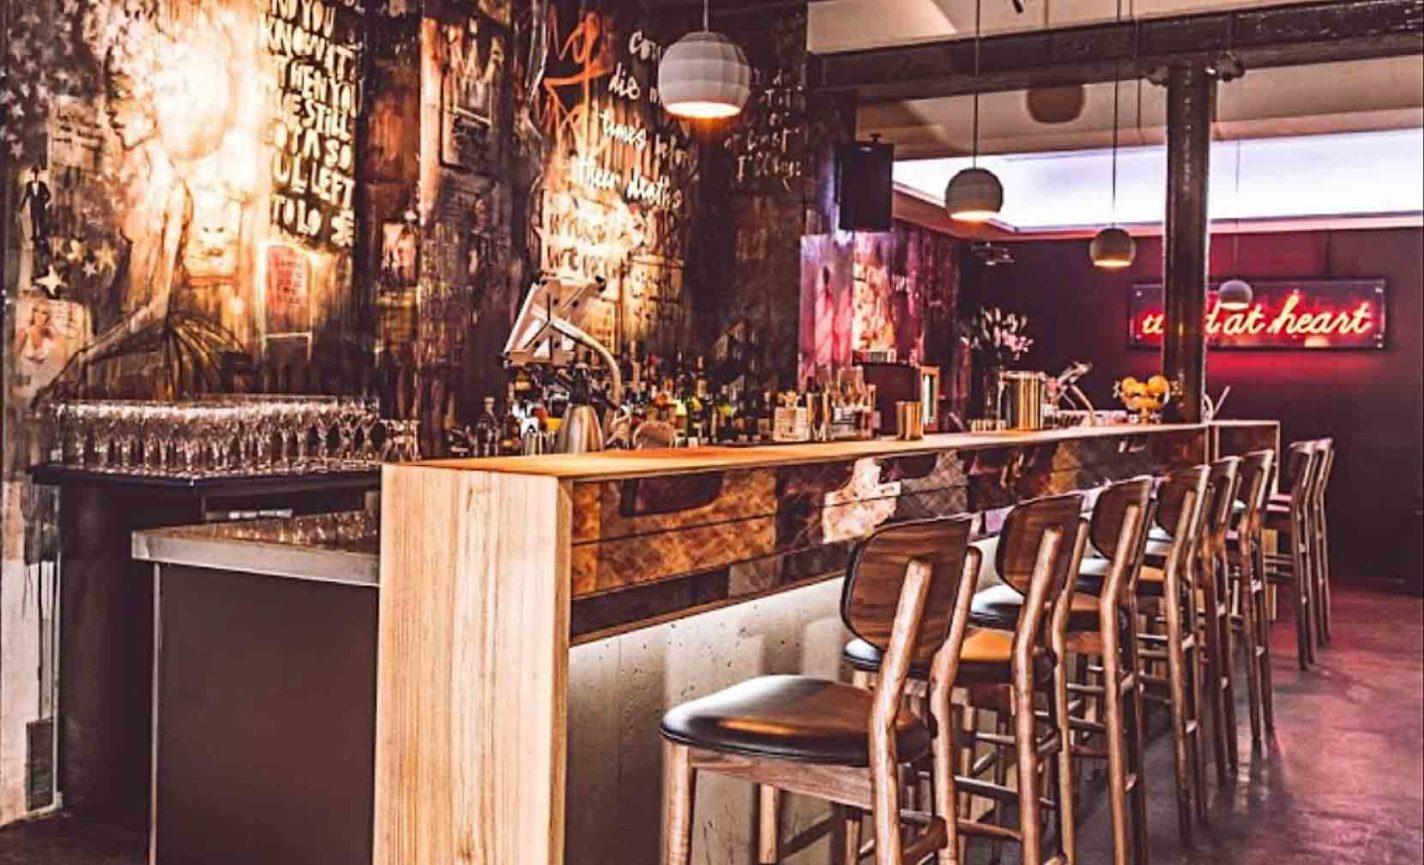 Chinaski Bar in Frankfurt am main - It's all about the Bars